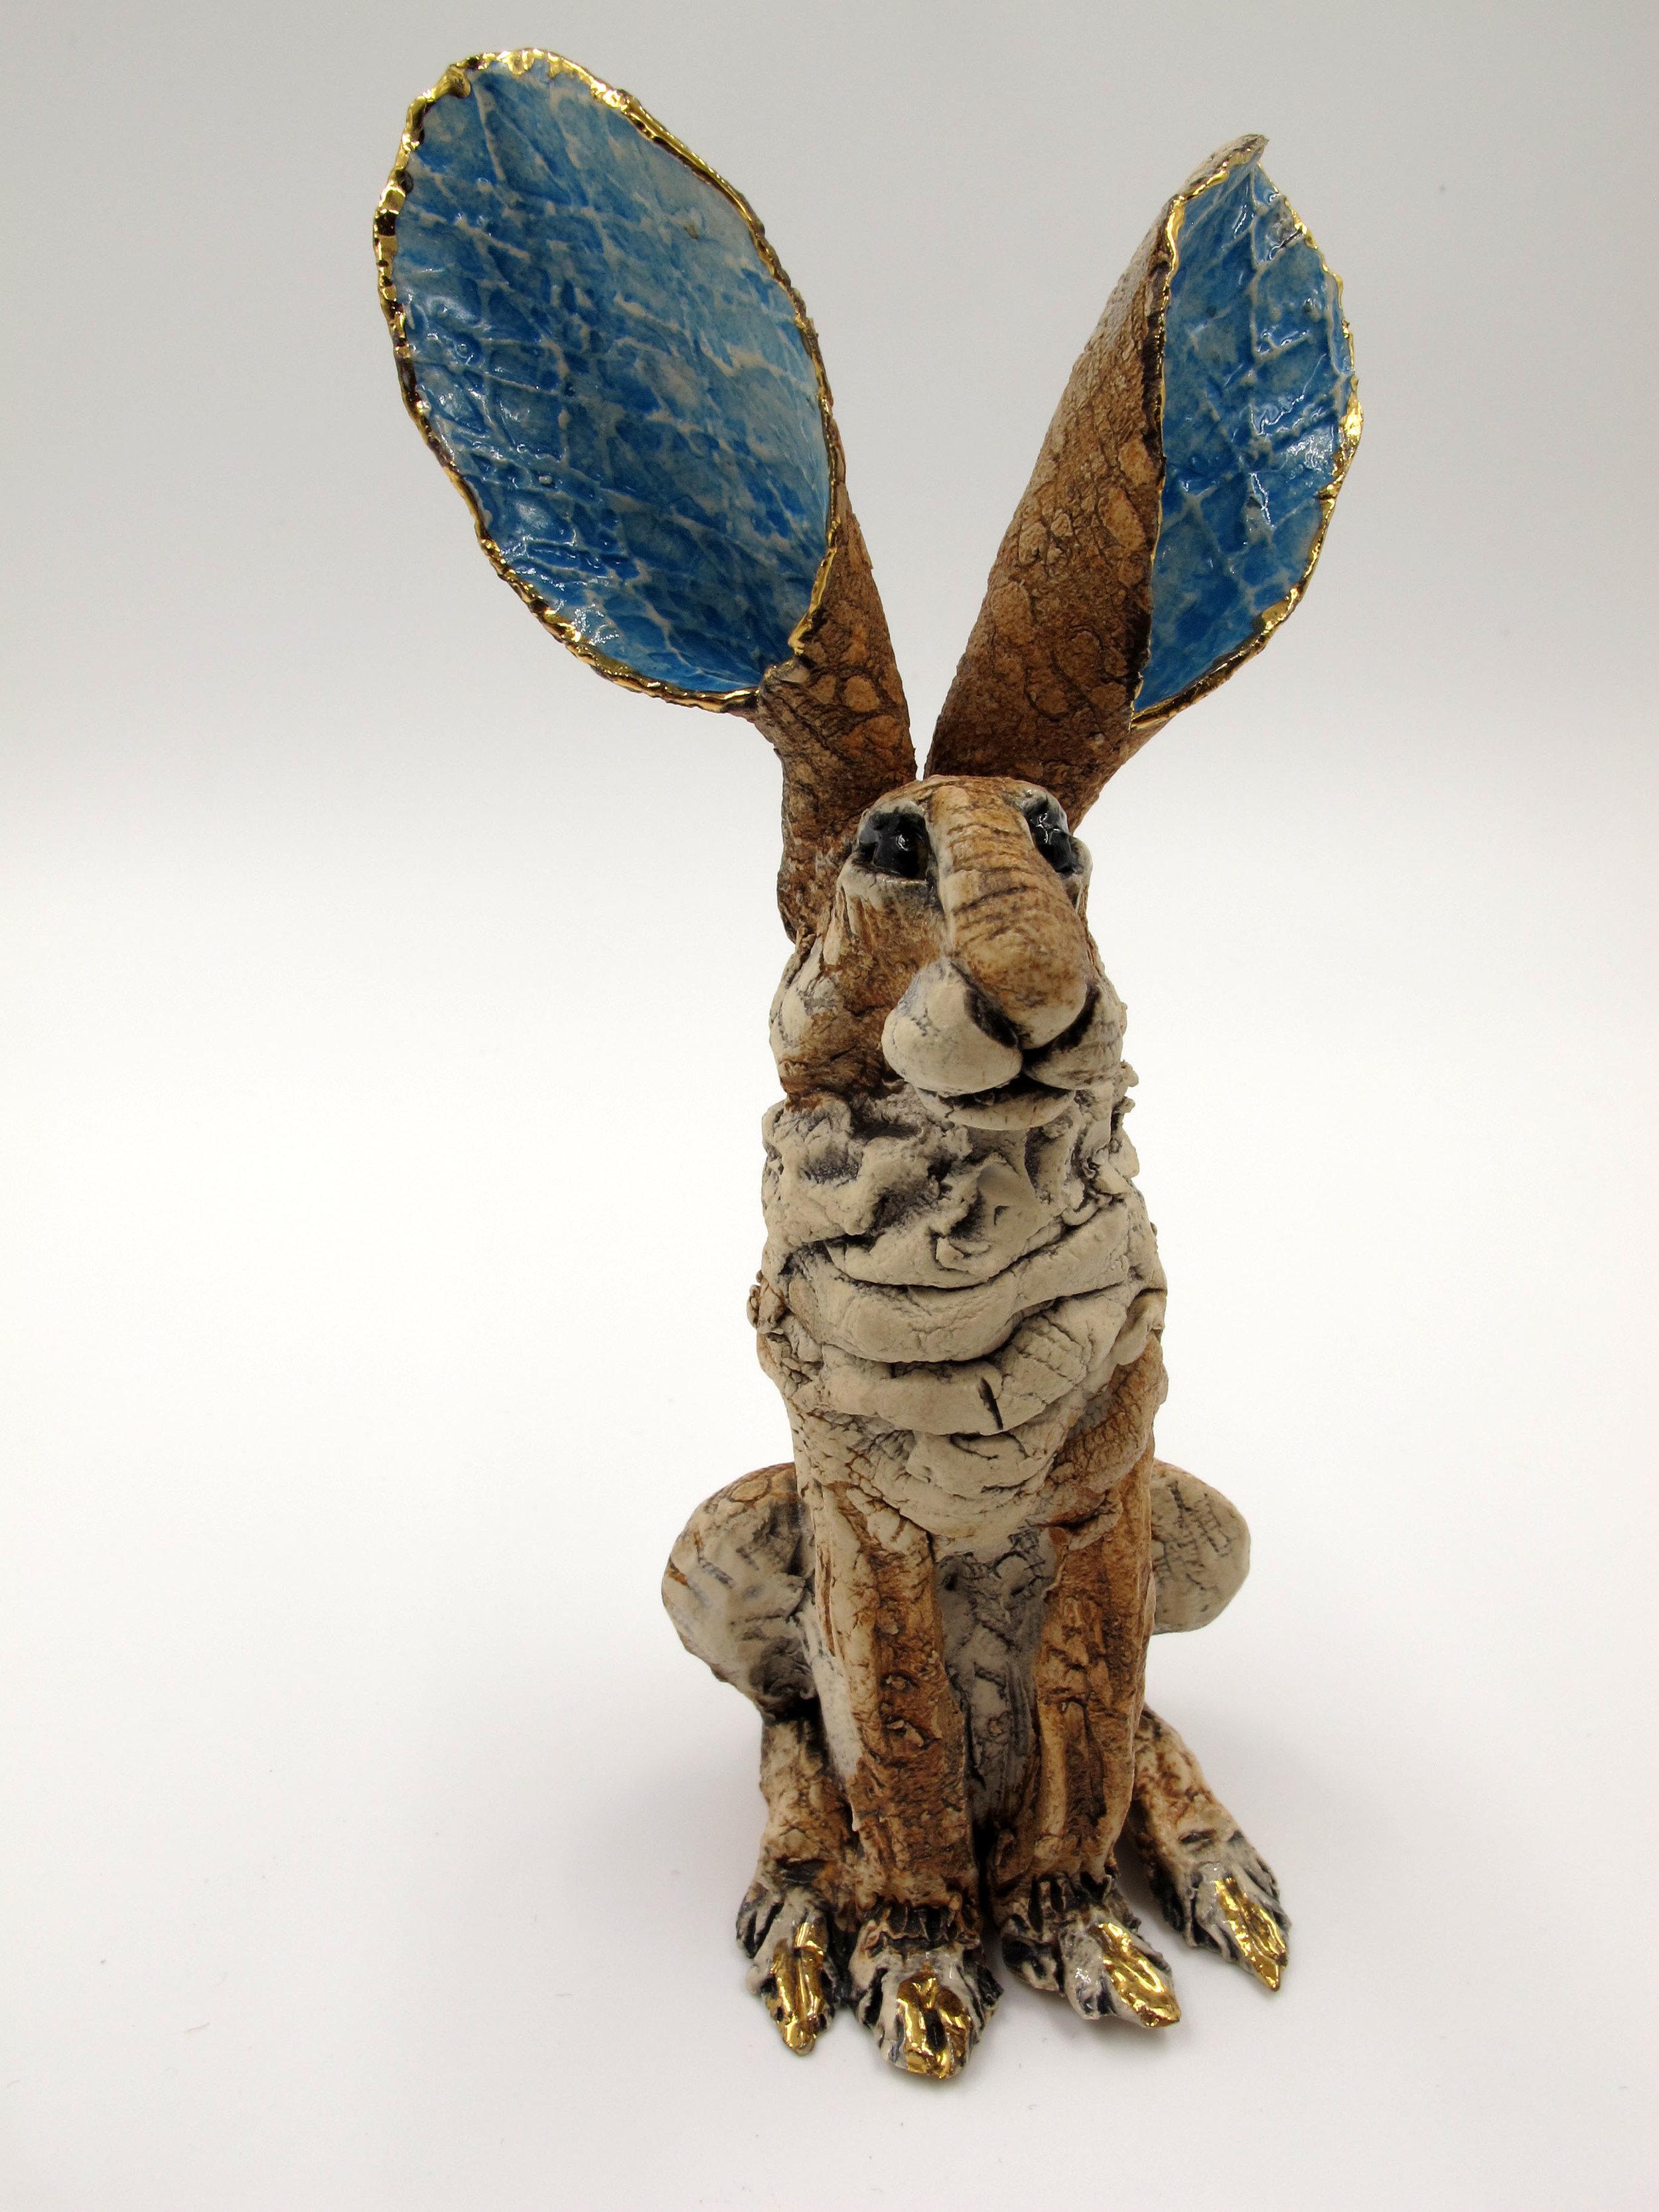 Ceramic sculpture by Gin Durham